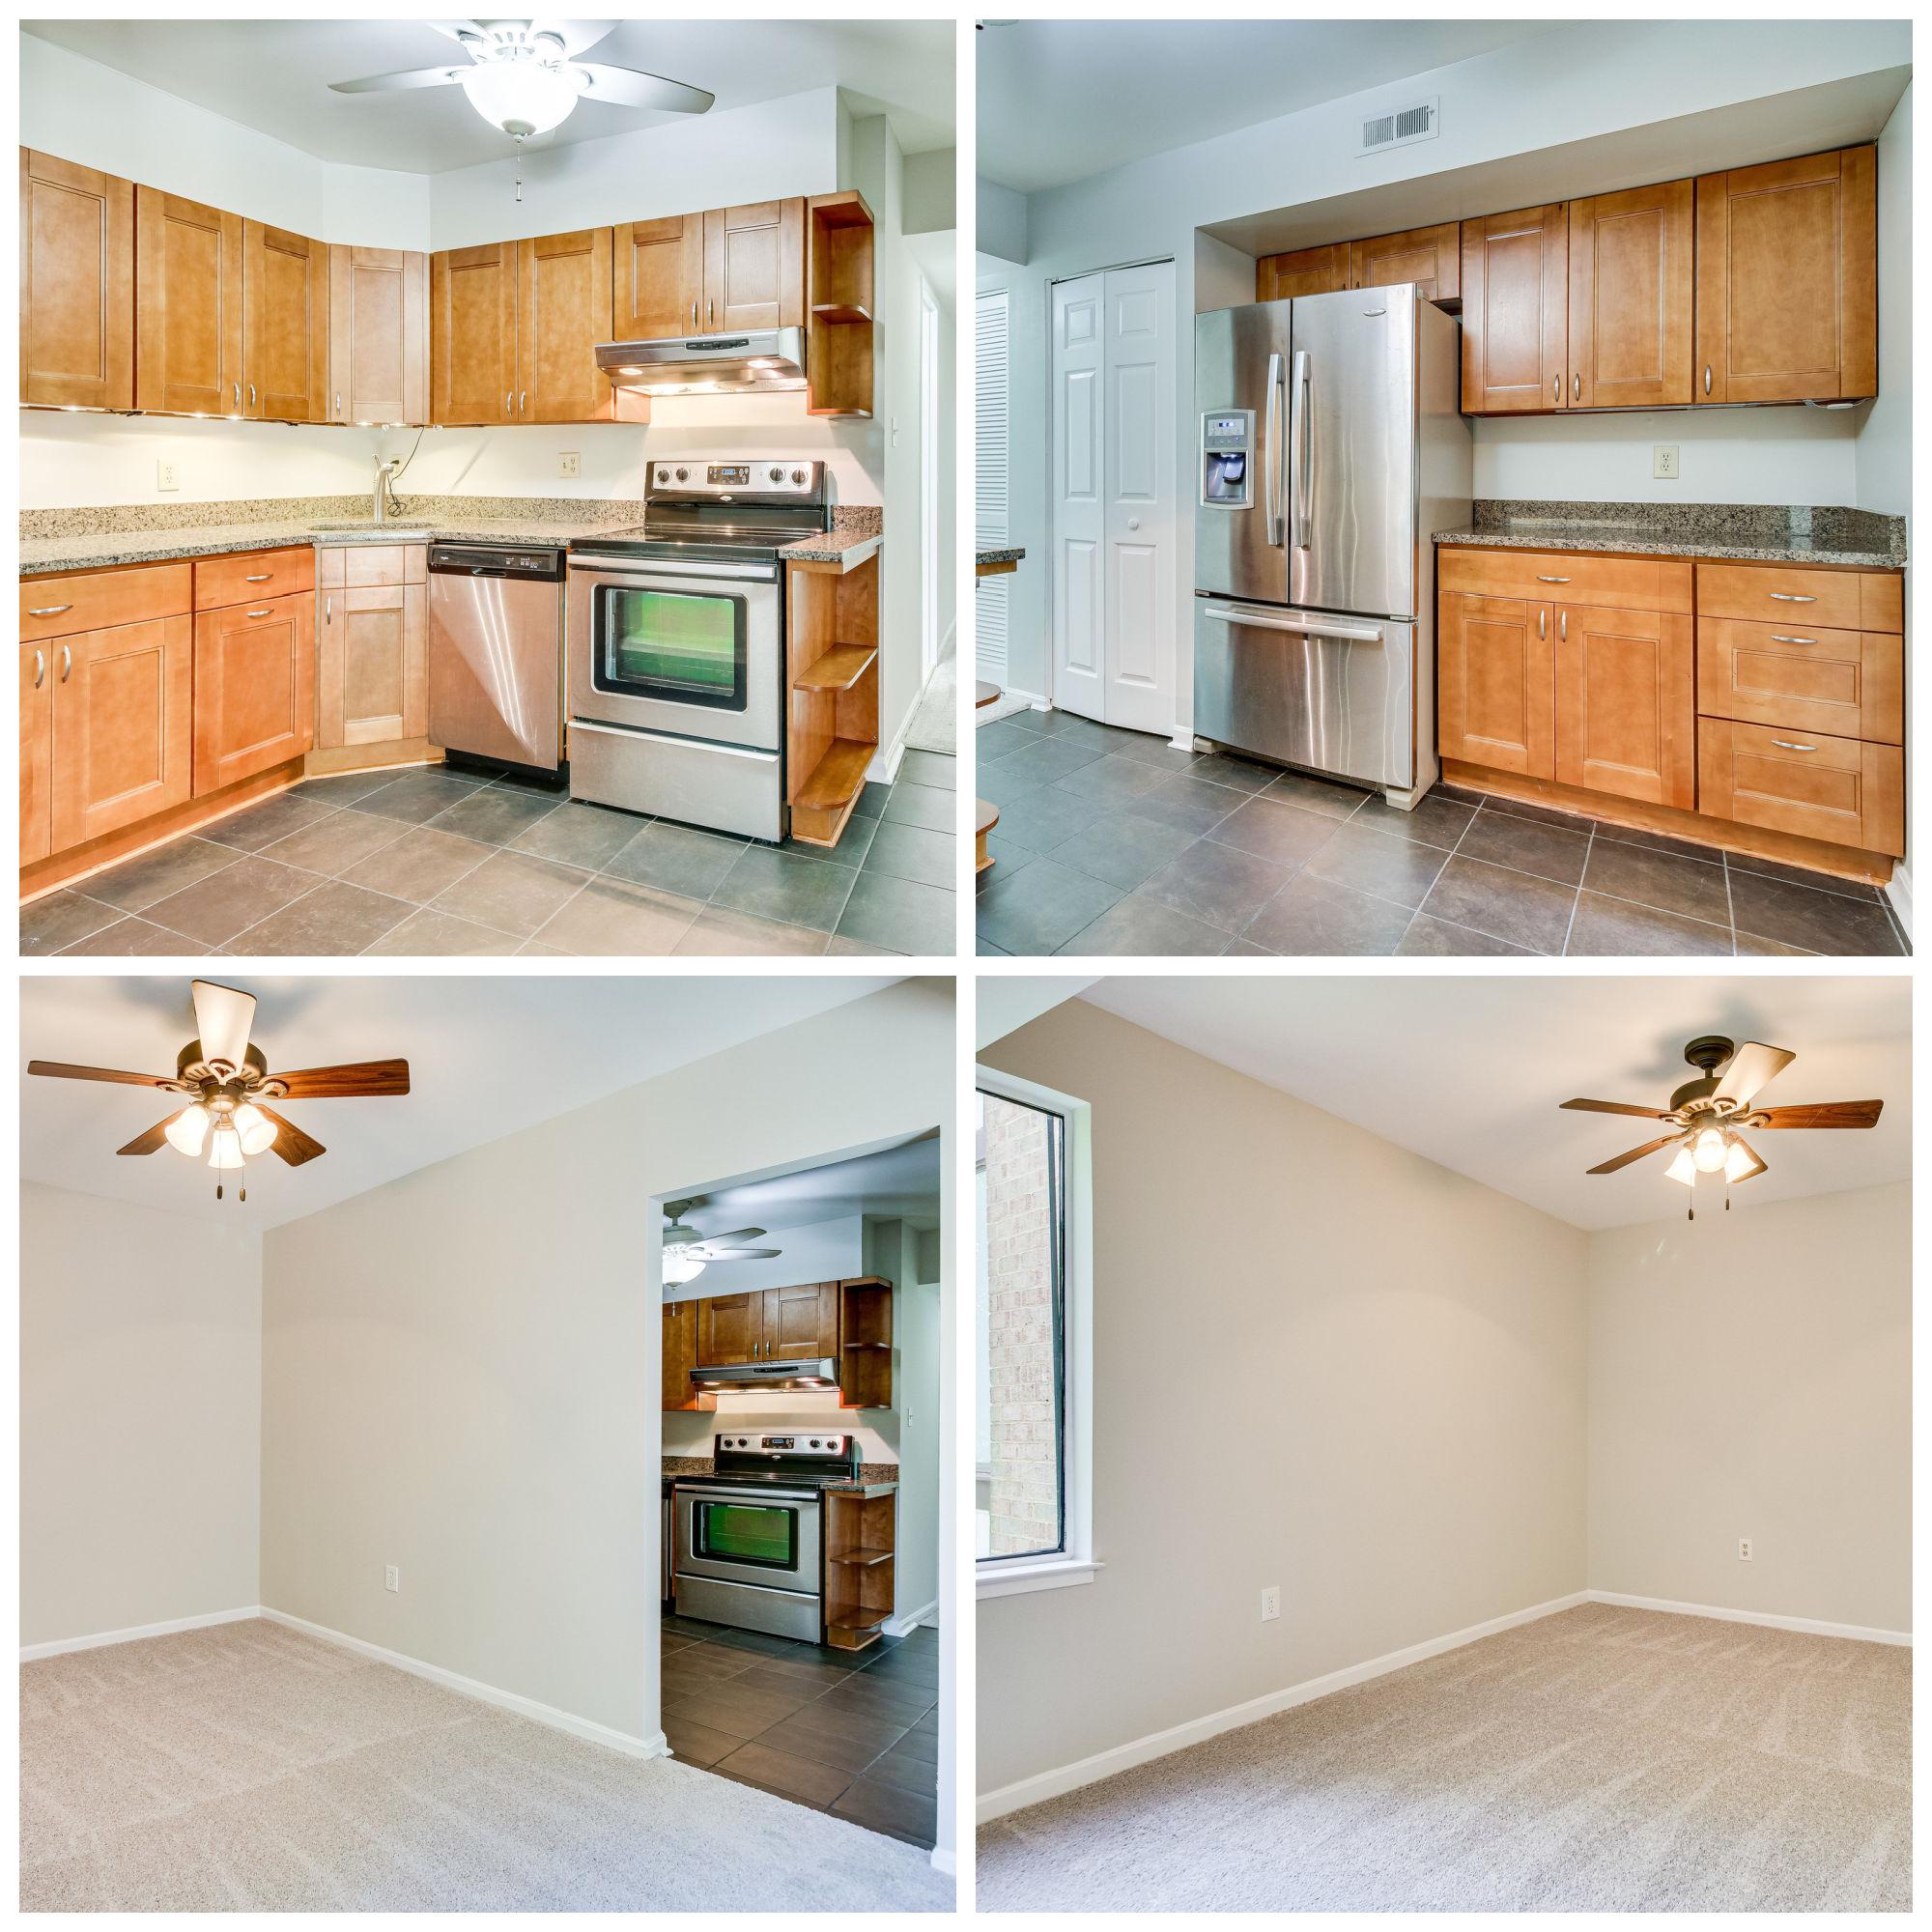 9810 Kingsbridge Dr #102, Fairfax- Kitchen and Dining Room